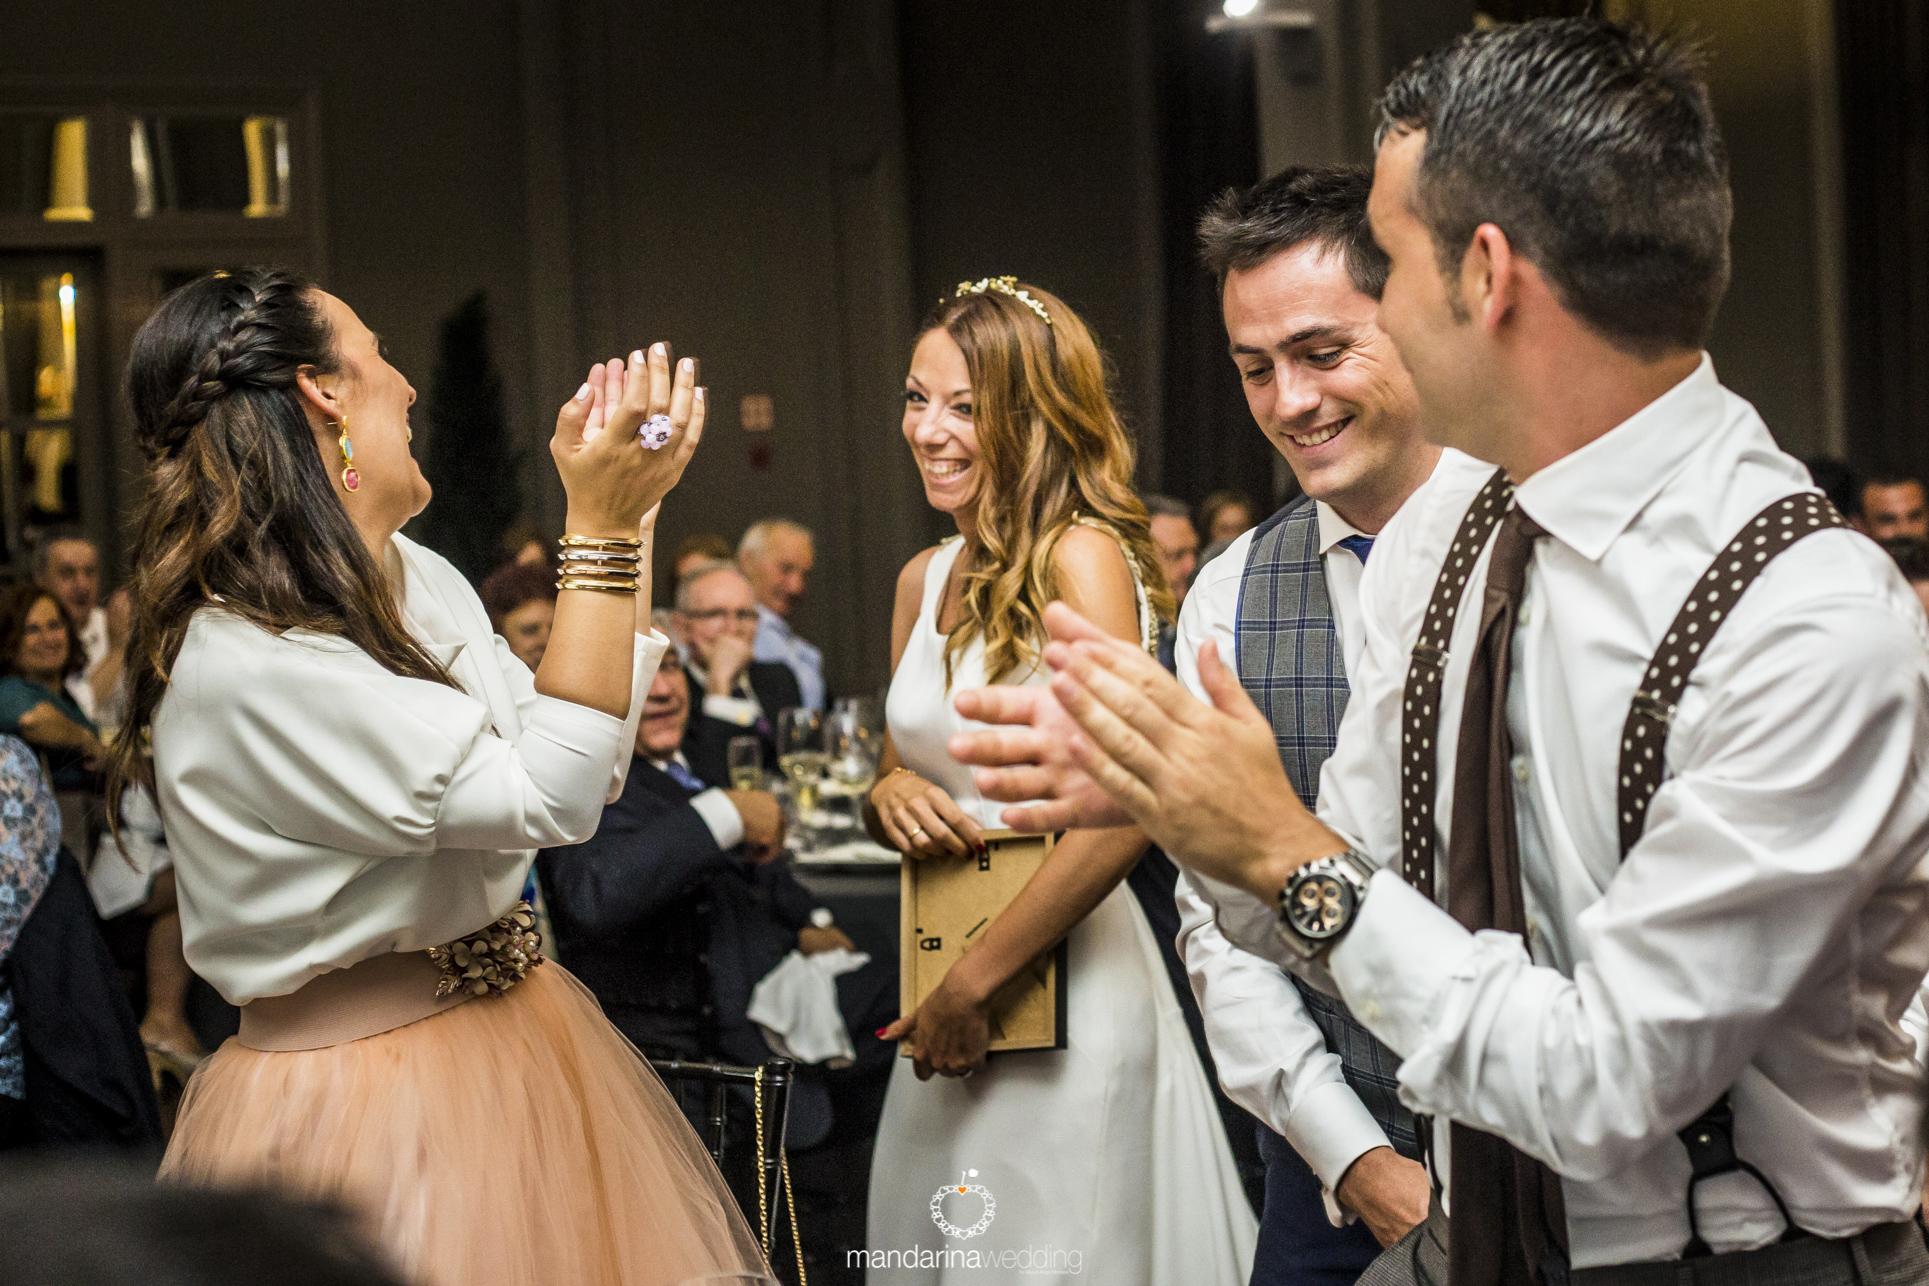 mandarina wedding, fotografo boda pais vasco, fotografo boda zaragoza, fotógrafo boda soria, fotografo boda Madrid, fotógrafo boda tarragona-07